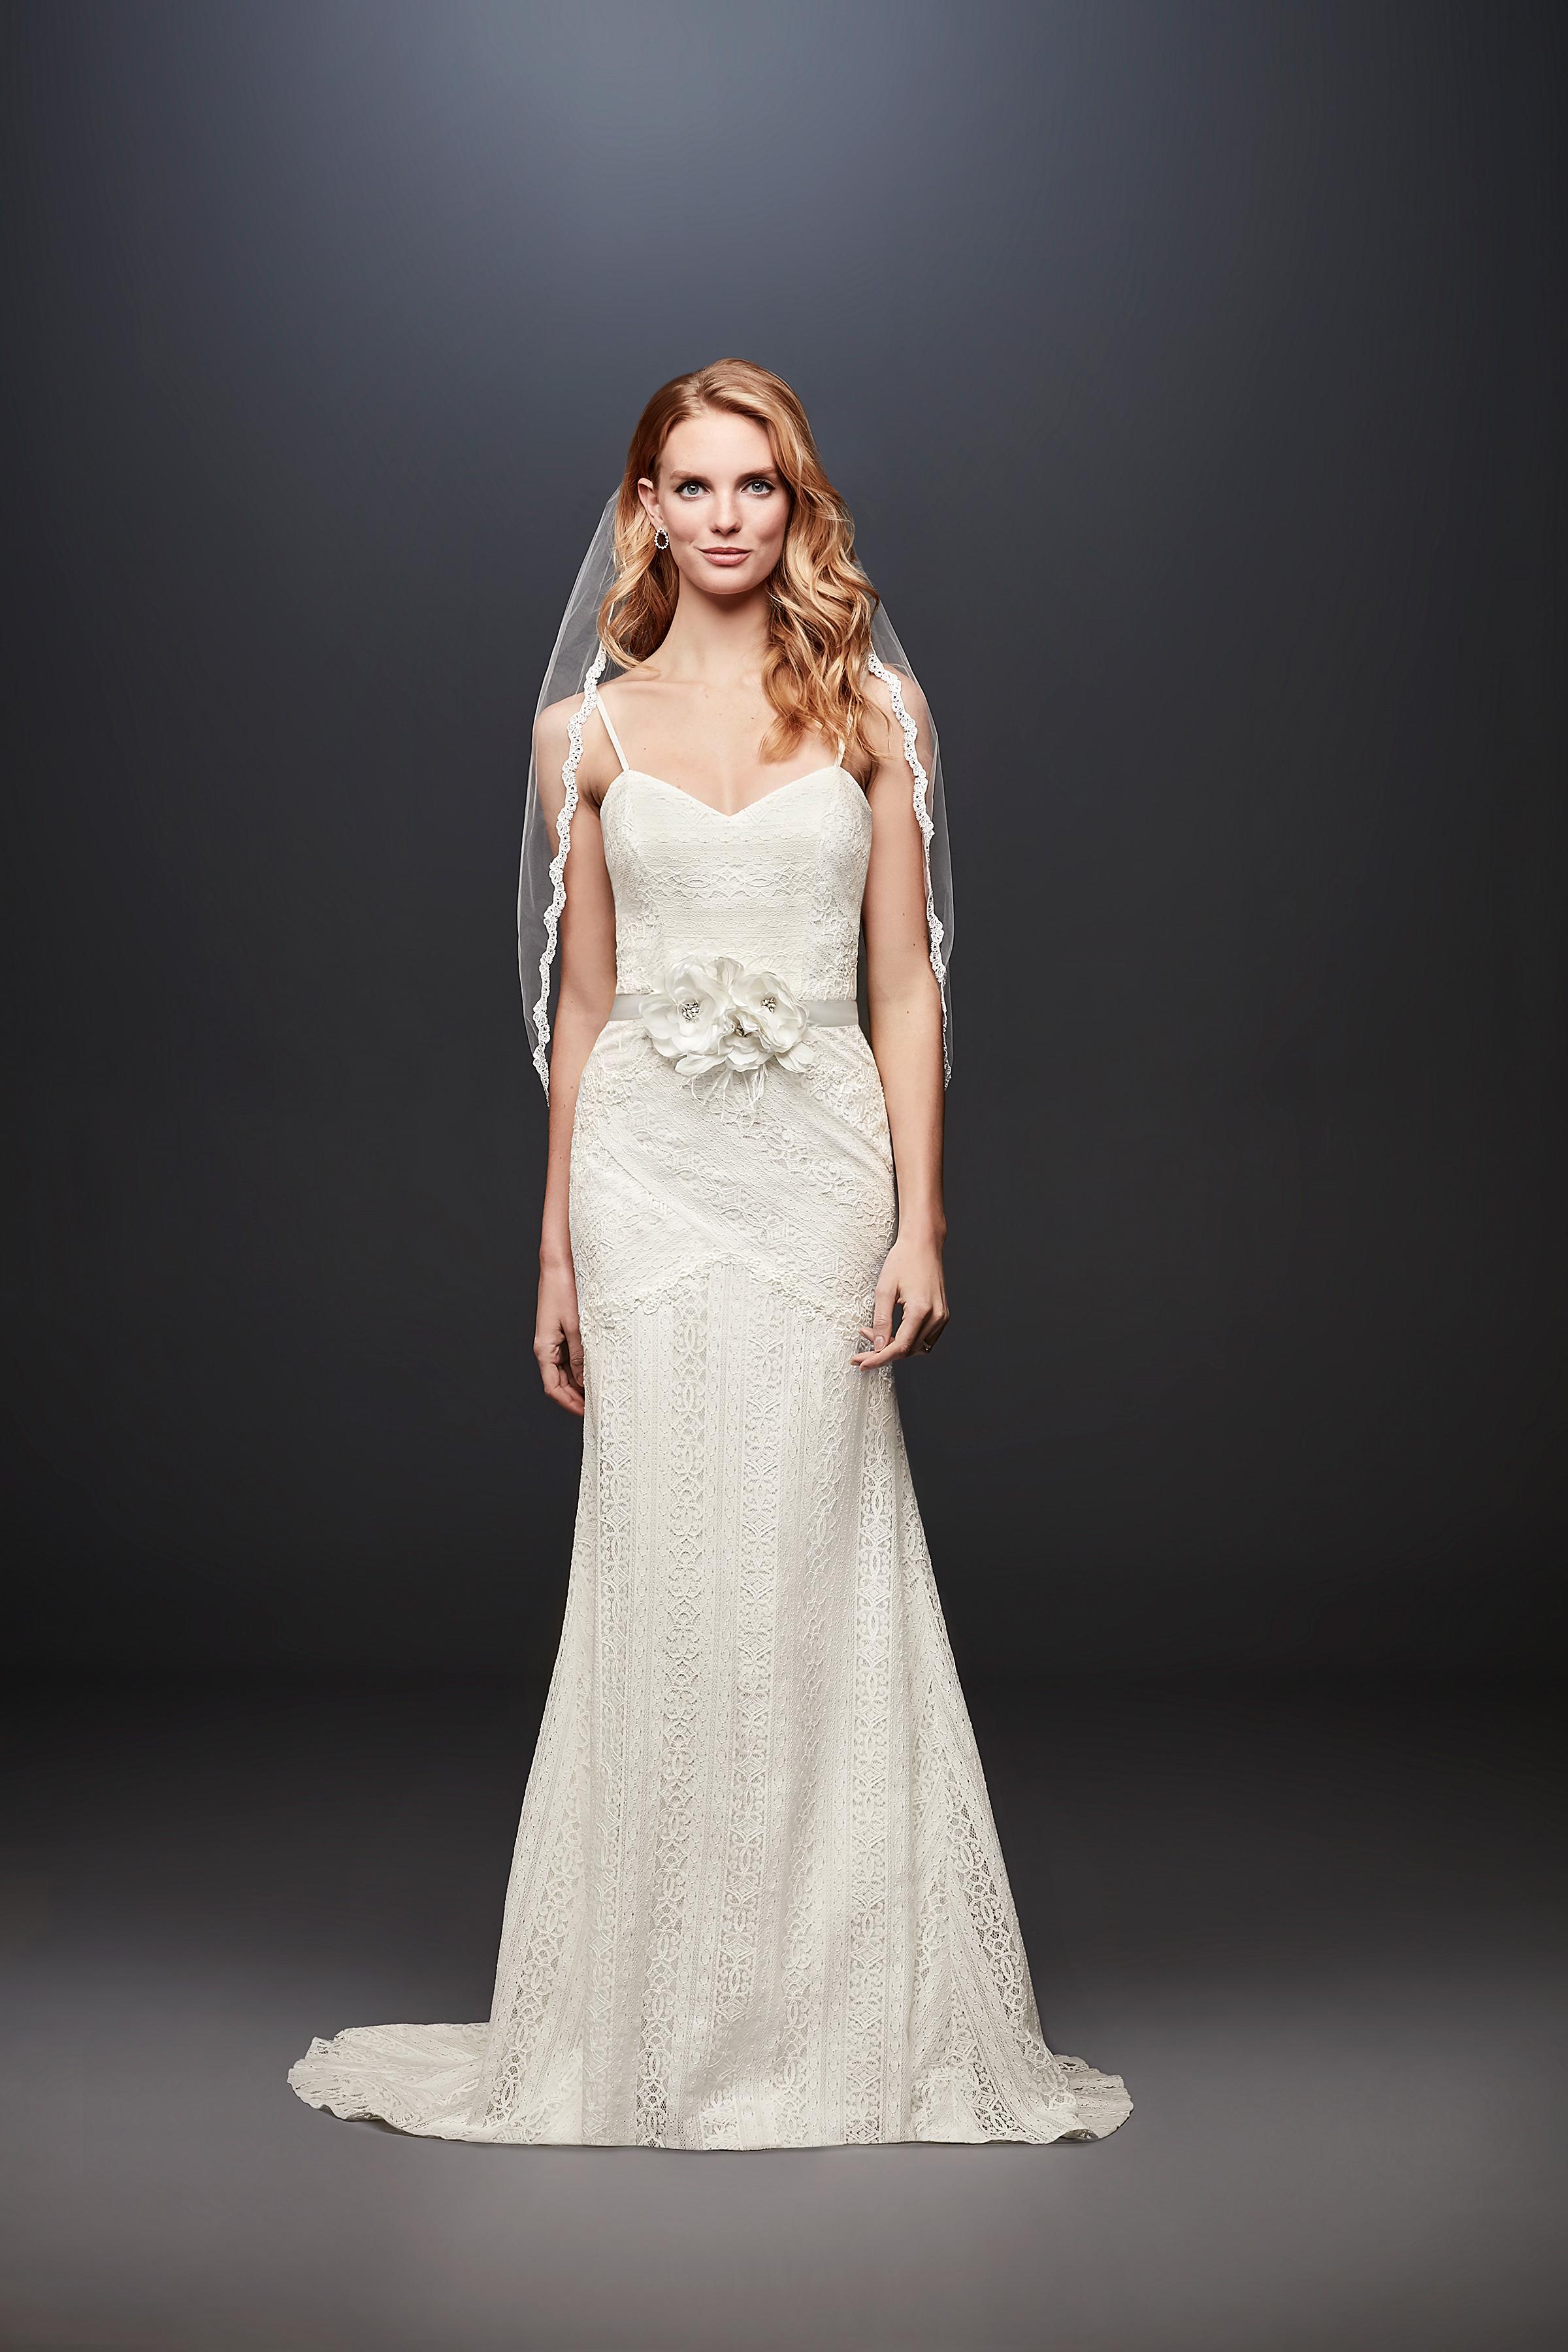 david bridal wedding dress spring 2019 spaghetti strap trumpet lace